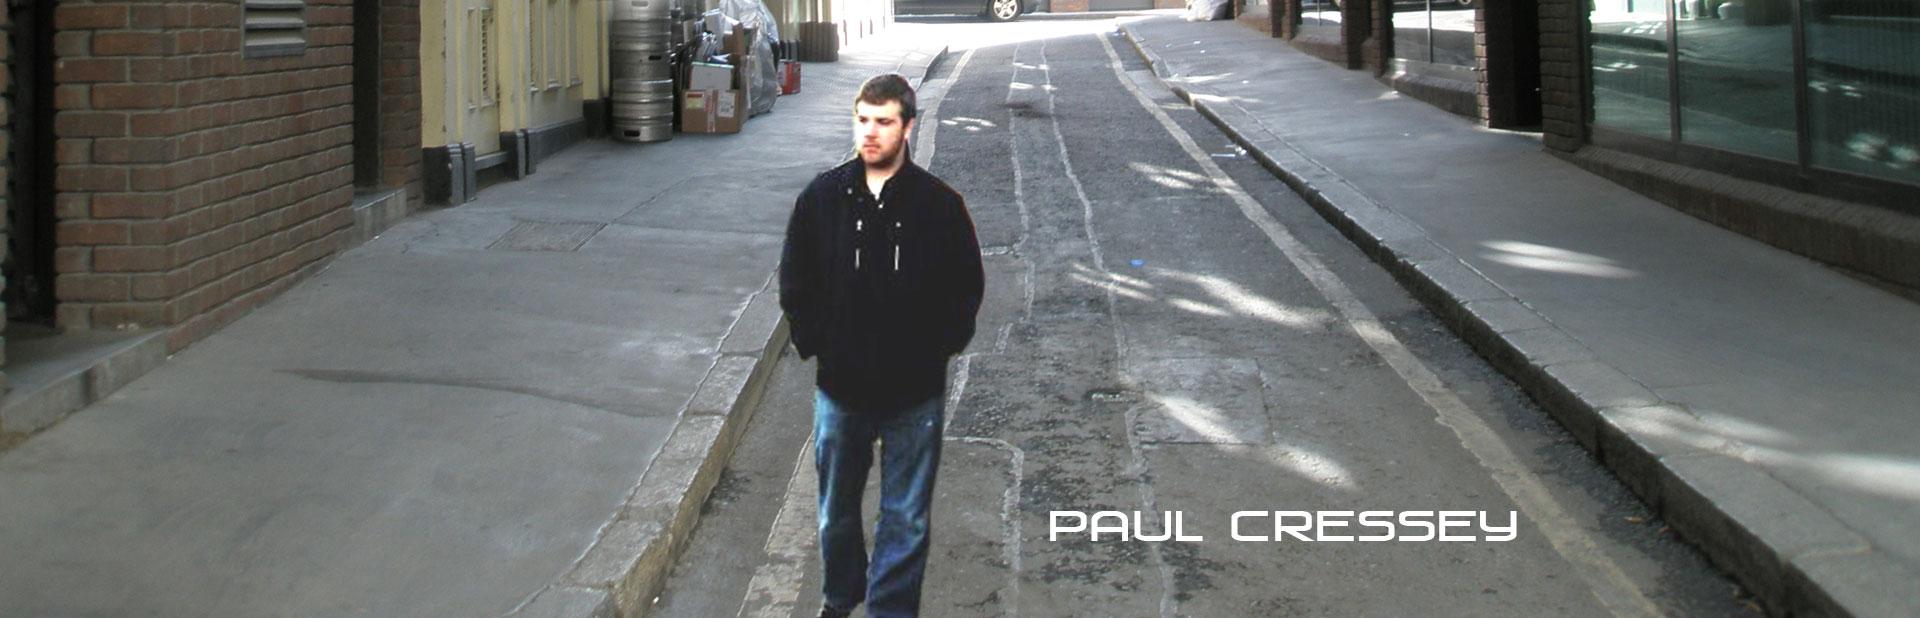 Paul Cressey